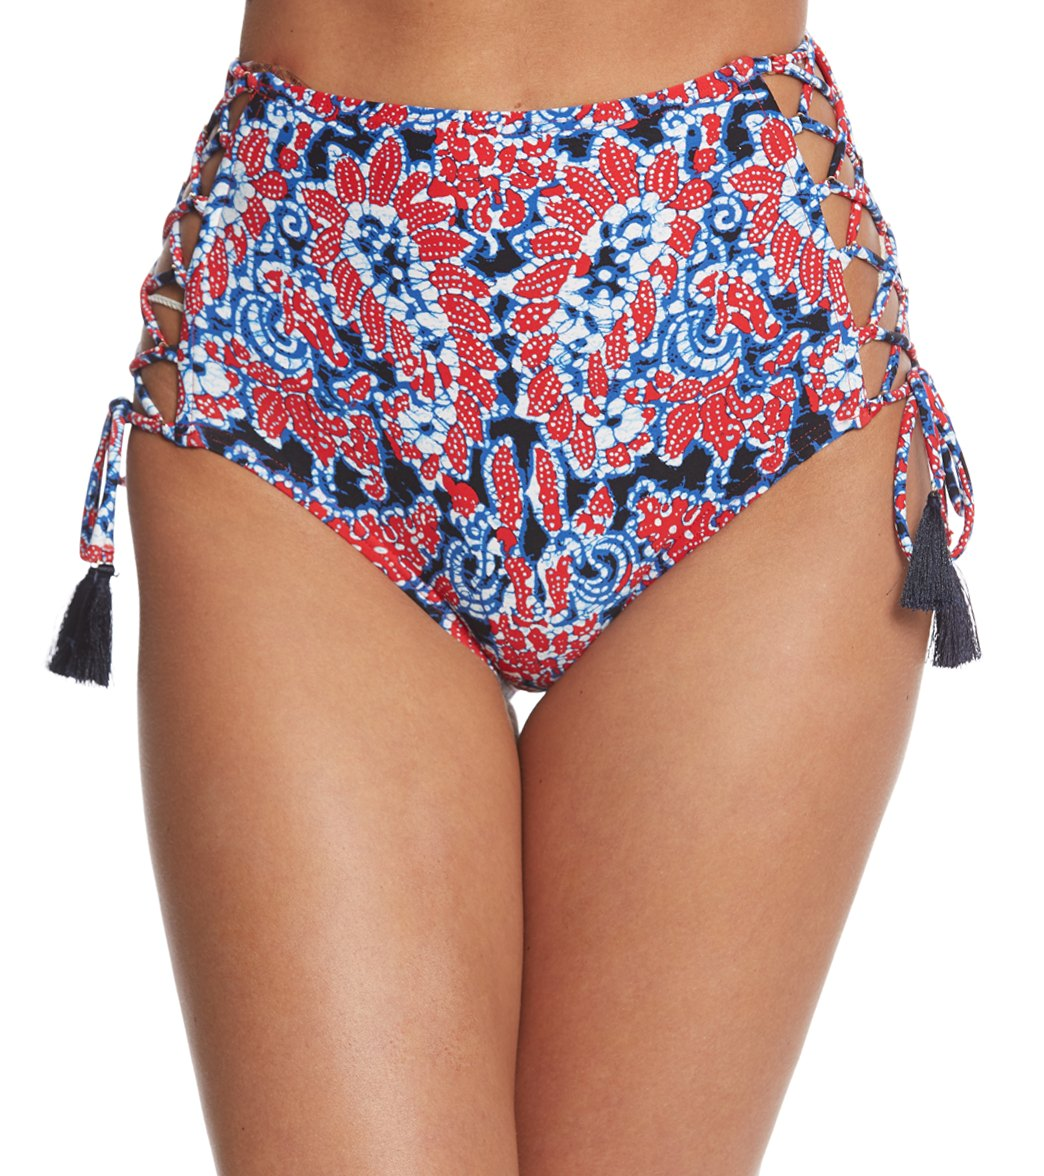 171ef338ffb68 Michael Kors Swimwear Angelina Lace Up High Waist Bikini Bottom at  SwimOutlet.com - Free Shipping